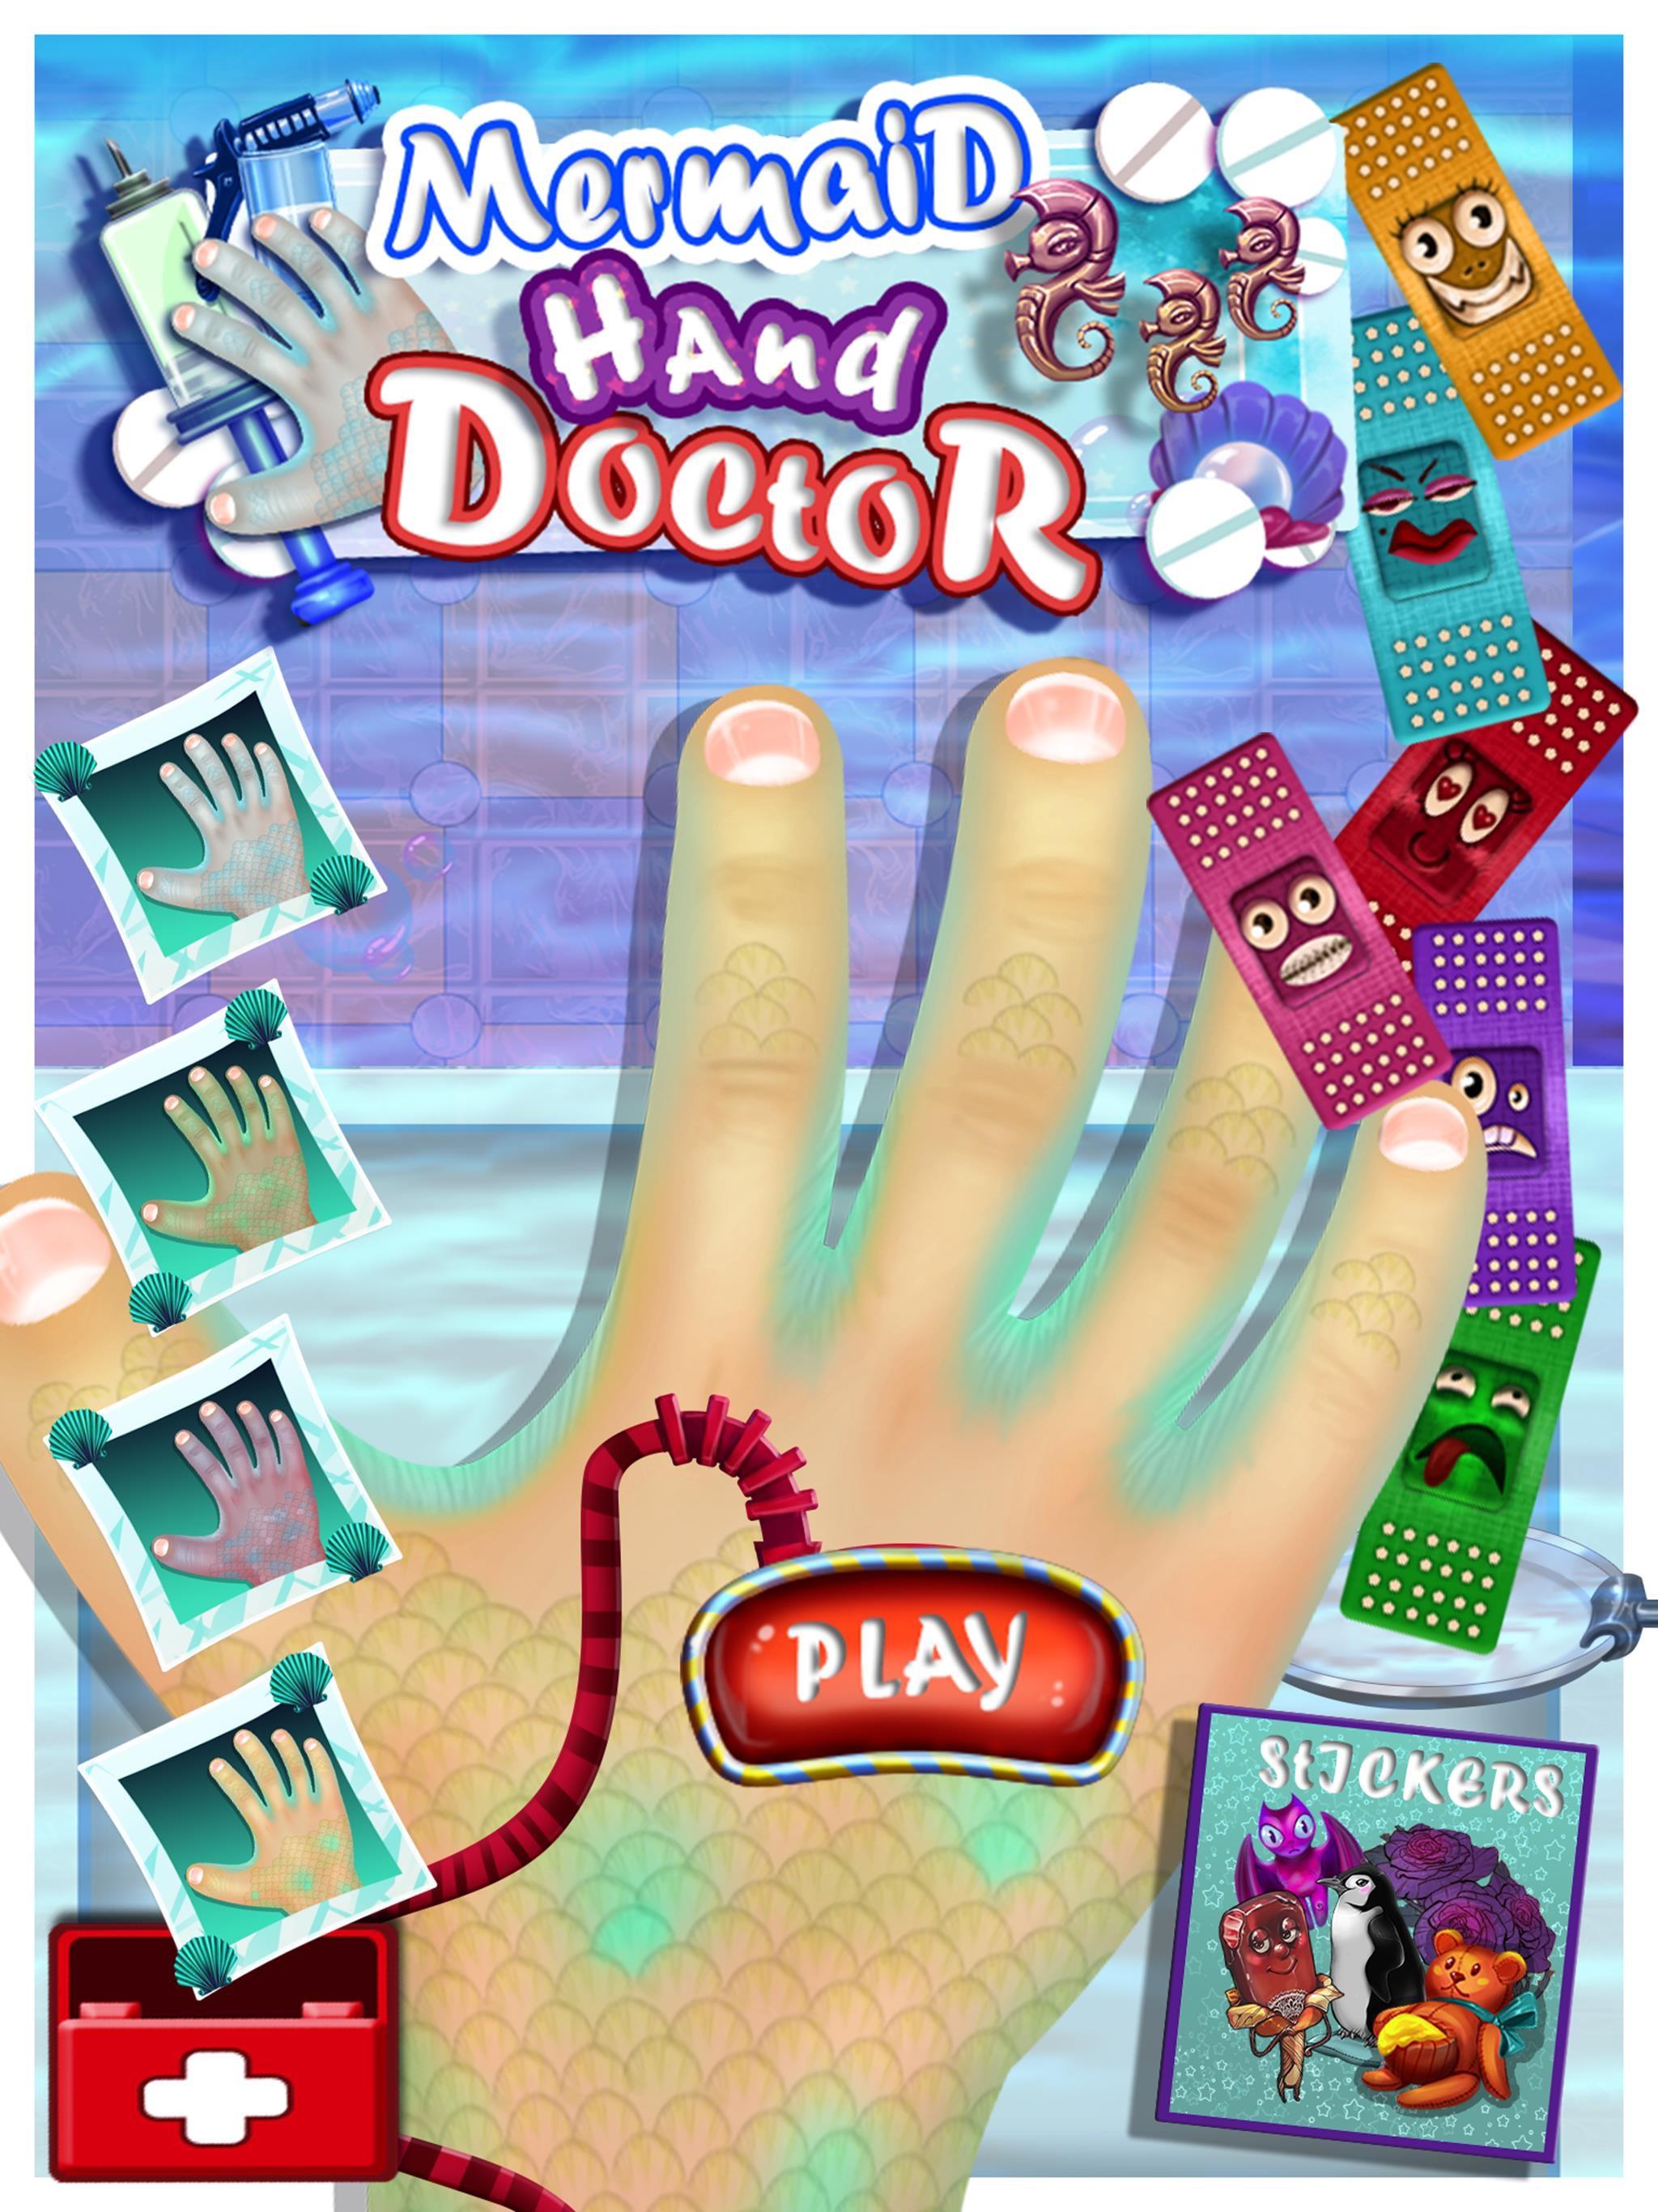 Mermaid Hand Doctor Hospital Little Fantasy Adventure Time ...